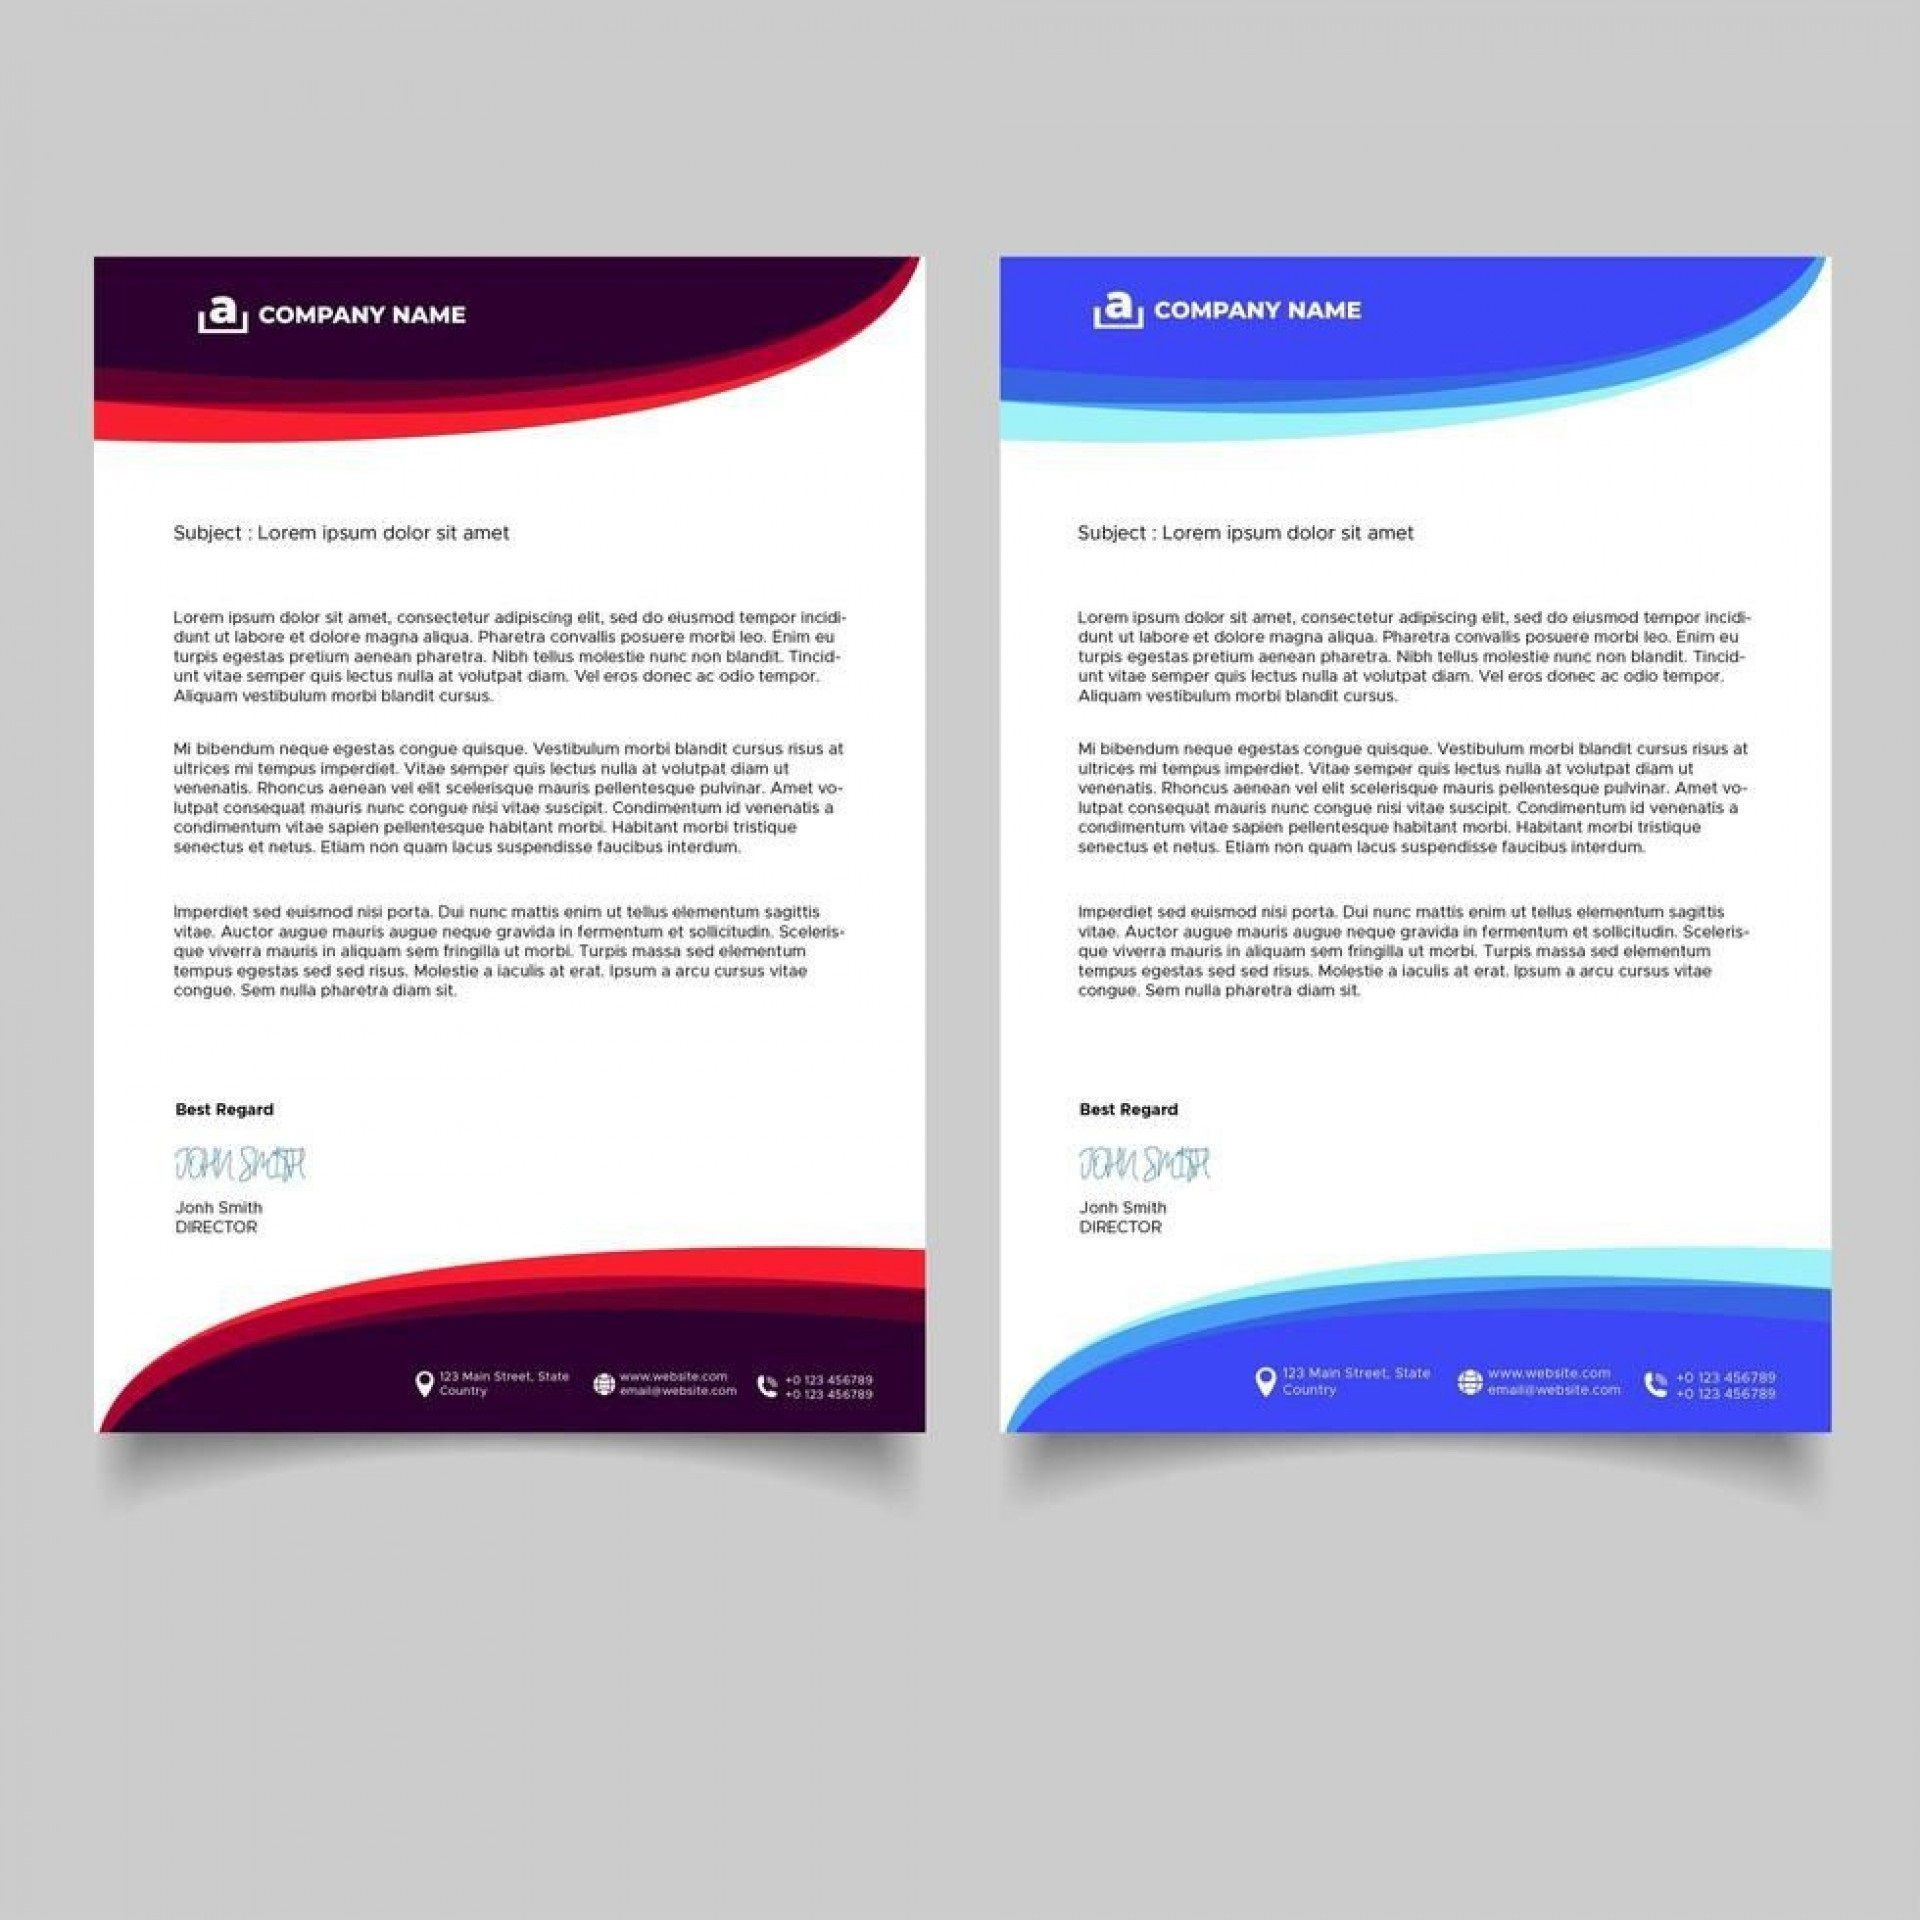 009 Wonderful Letterhead Template Free Download Ai Design  File1920